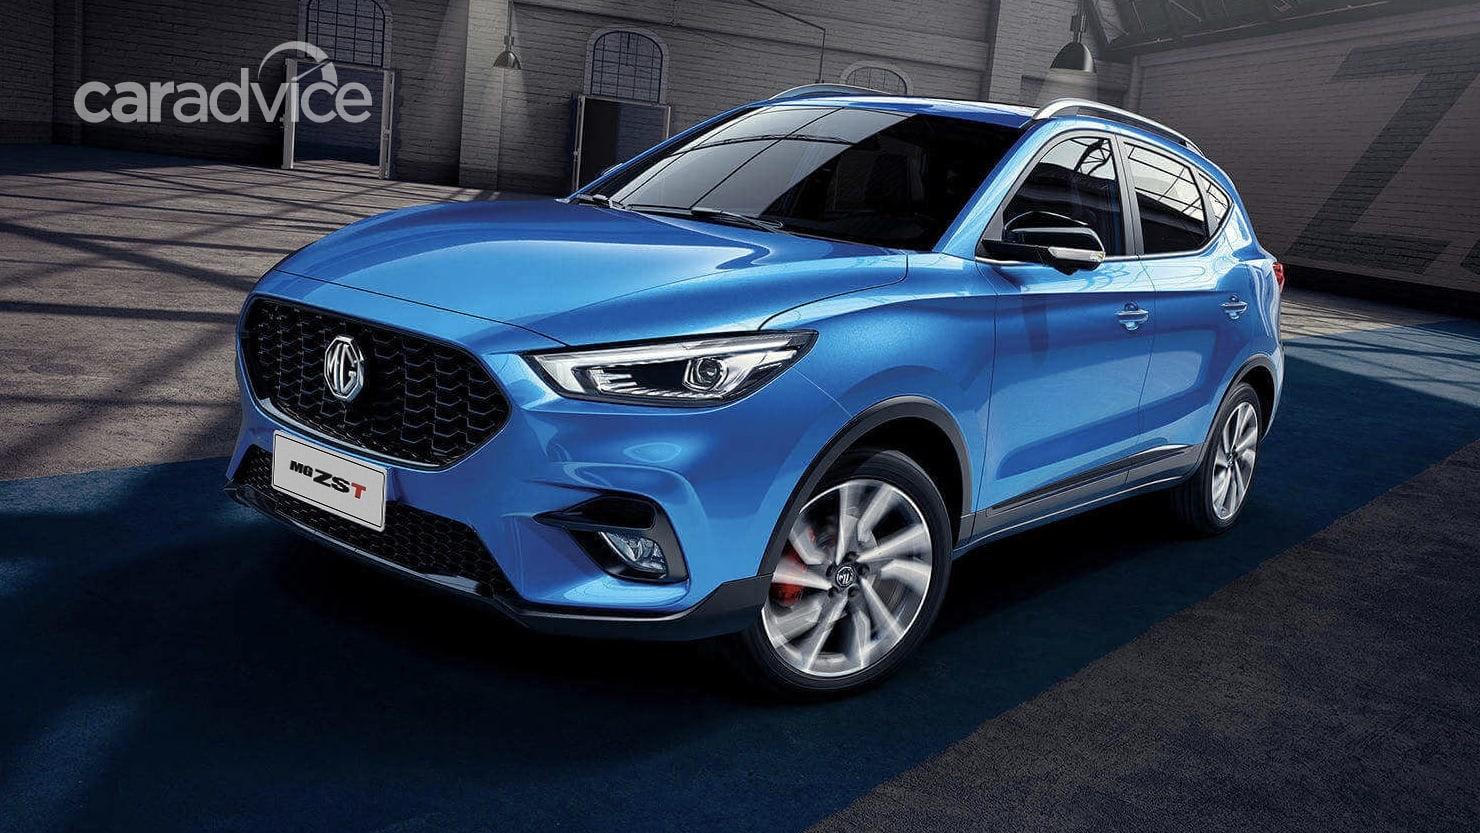 Morris Garage Mesin Turbo Ramaikan Pasar SUV Ringkas Bulan Depan